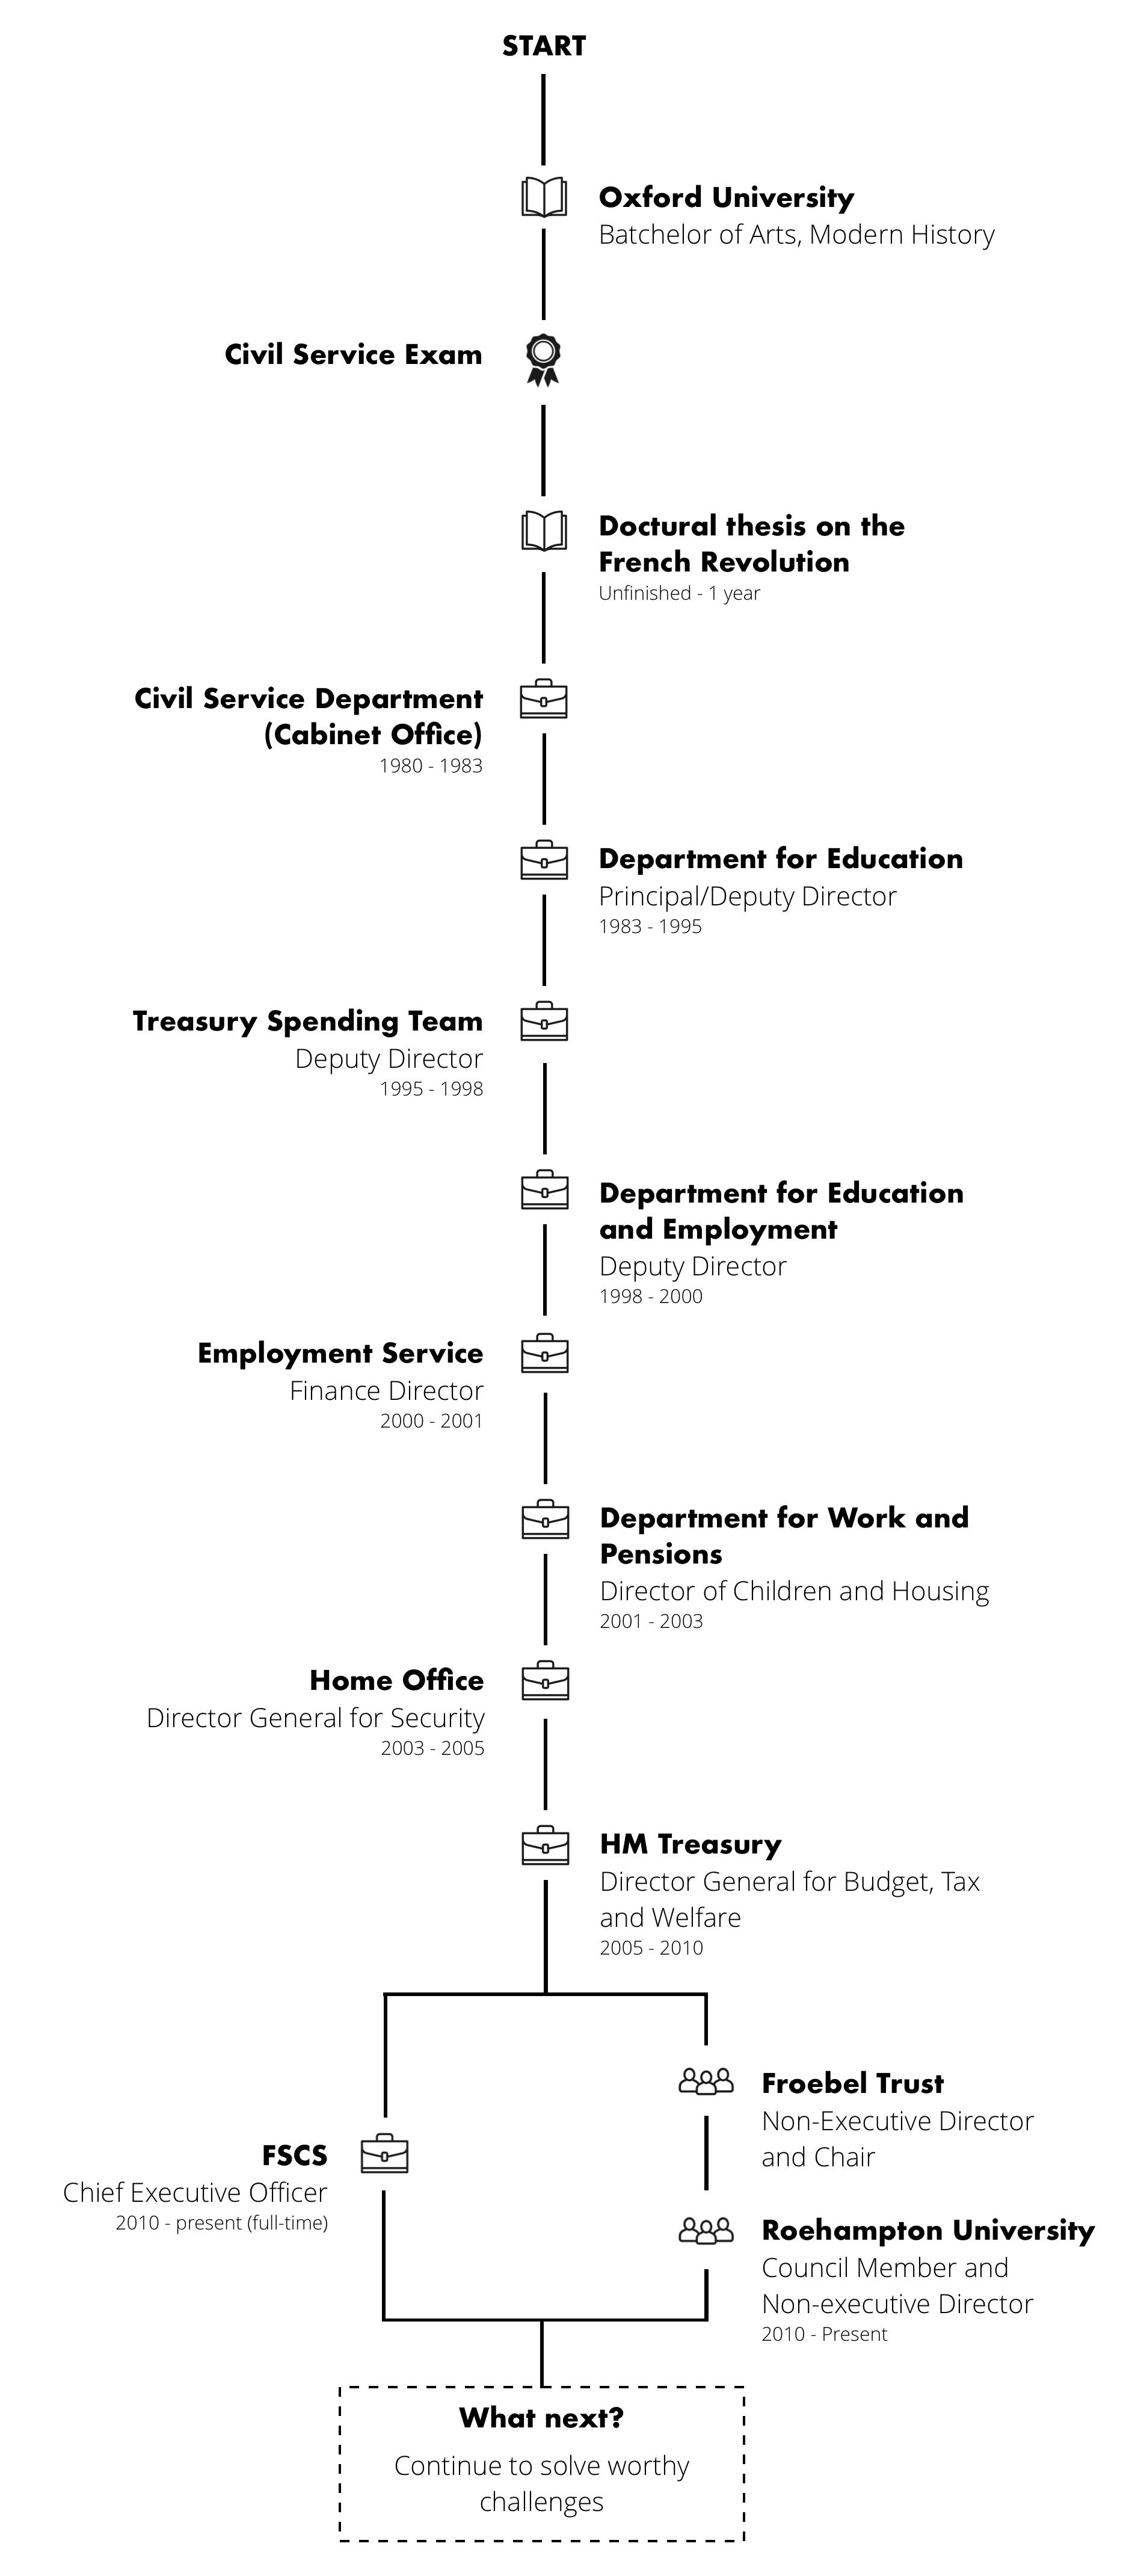 FSCS-renegade-generation-career-journey-map-mark-neale.png